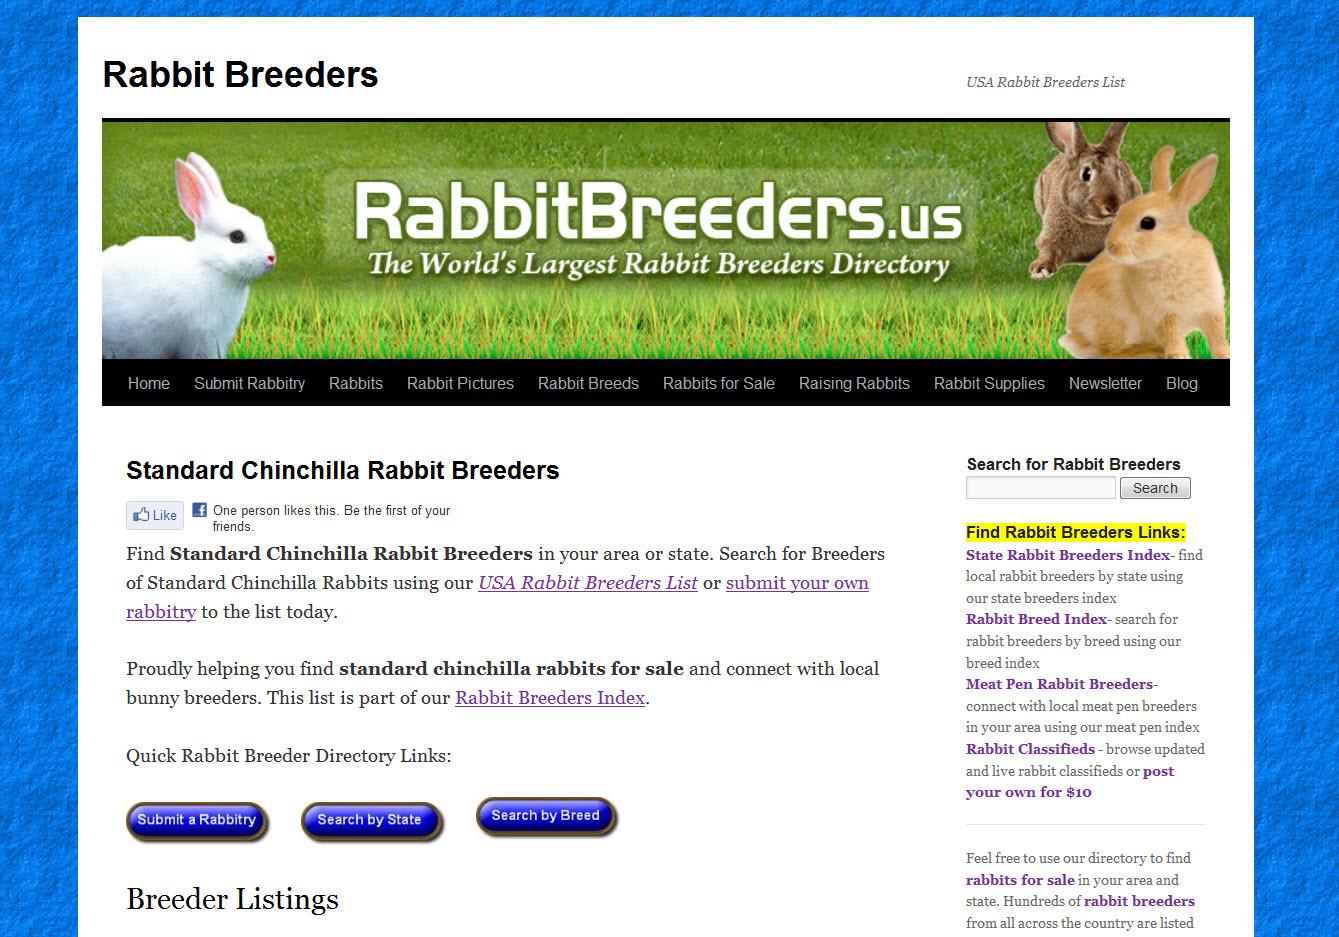 Standard Chinchilla Rabbit Breeders